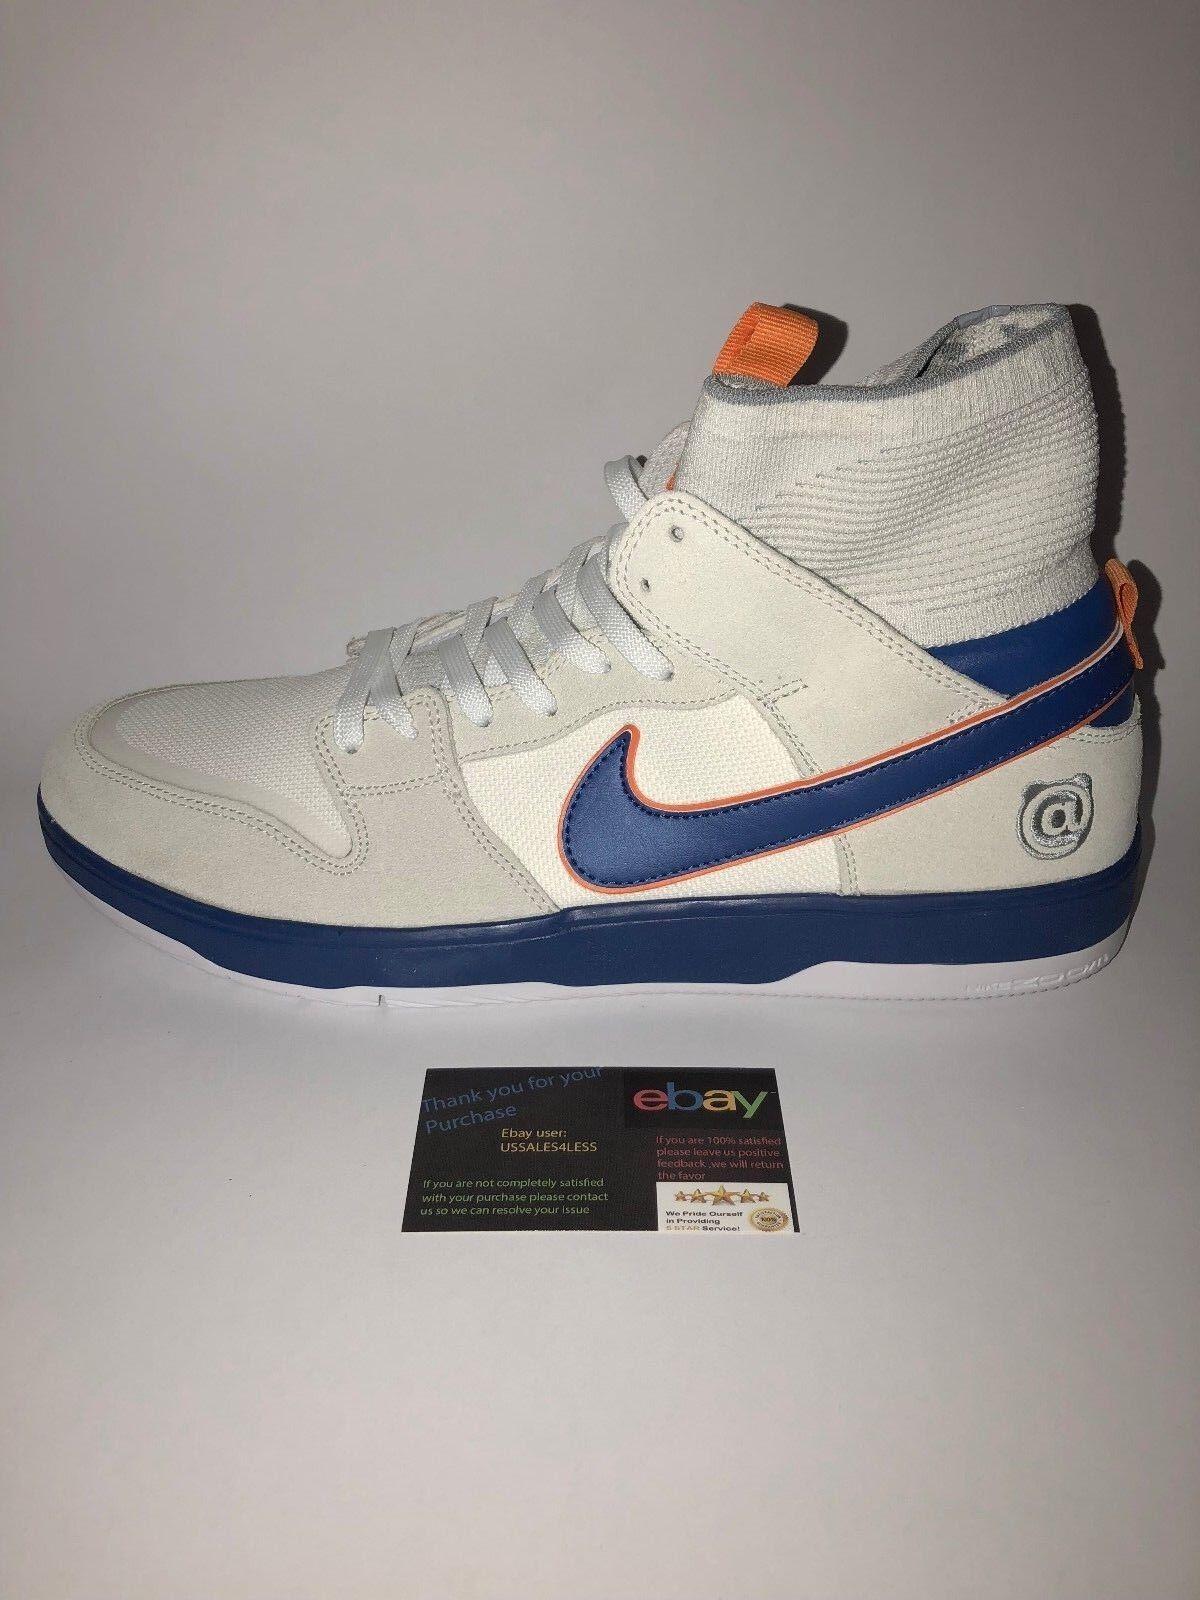 Nike sb x medicom zoom canestro alto alto canestro elite qs sz: 13 (918287-147) bearbrick 960622